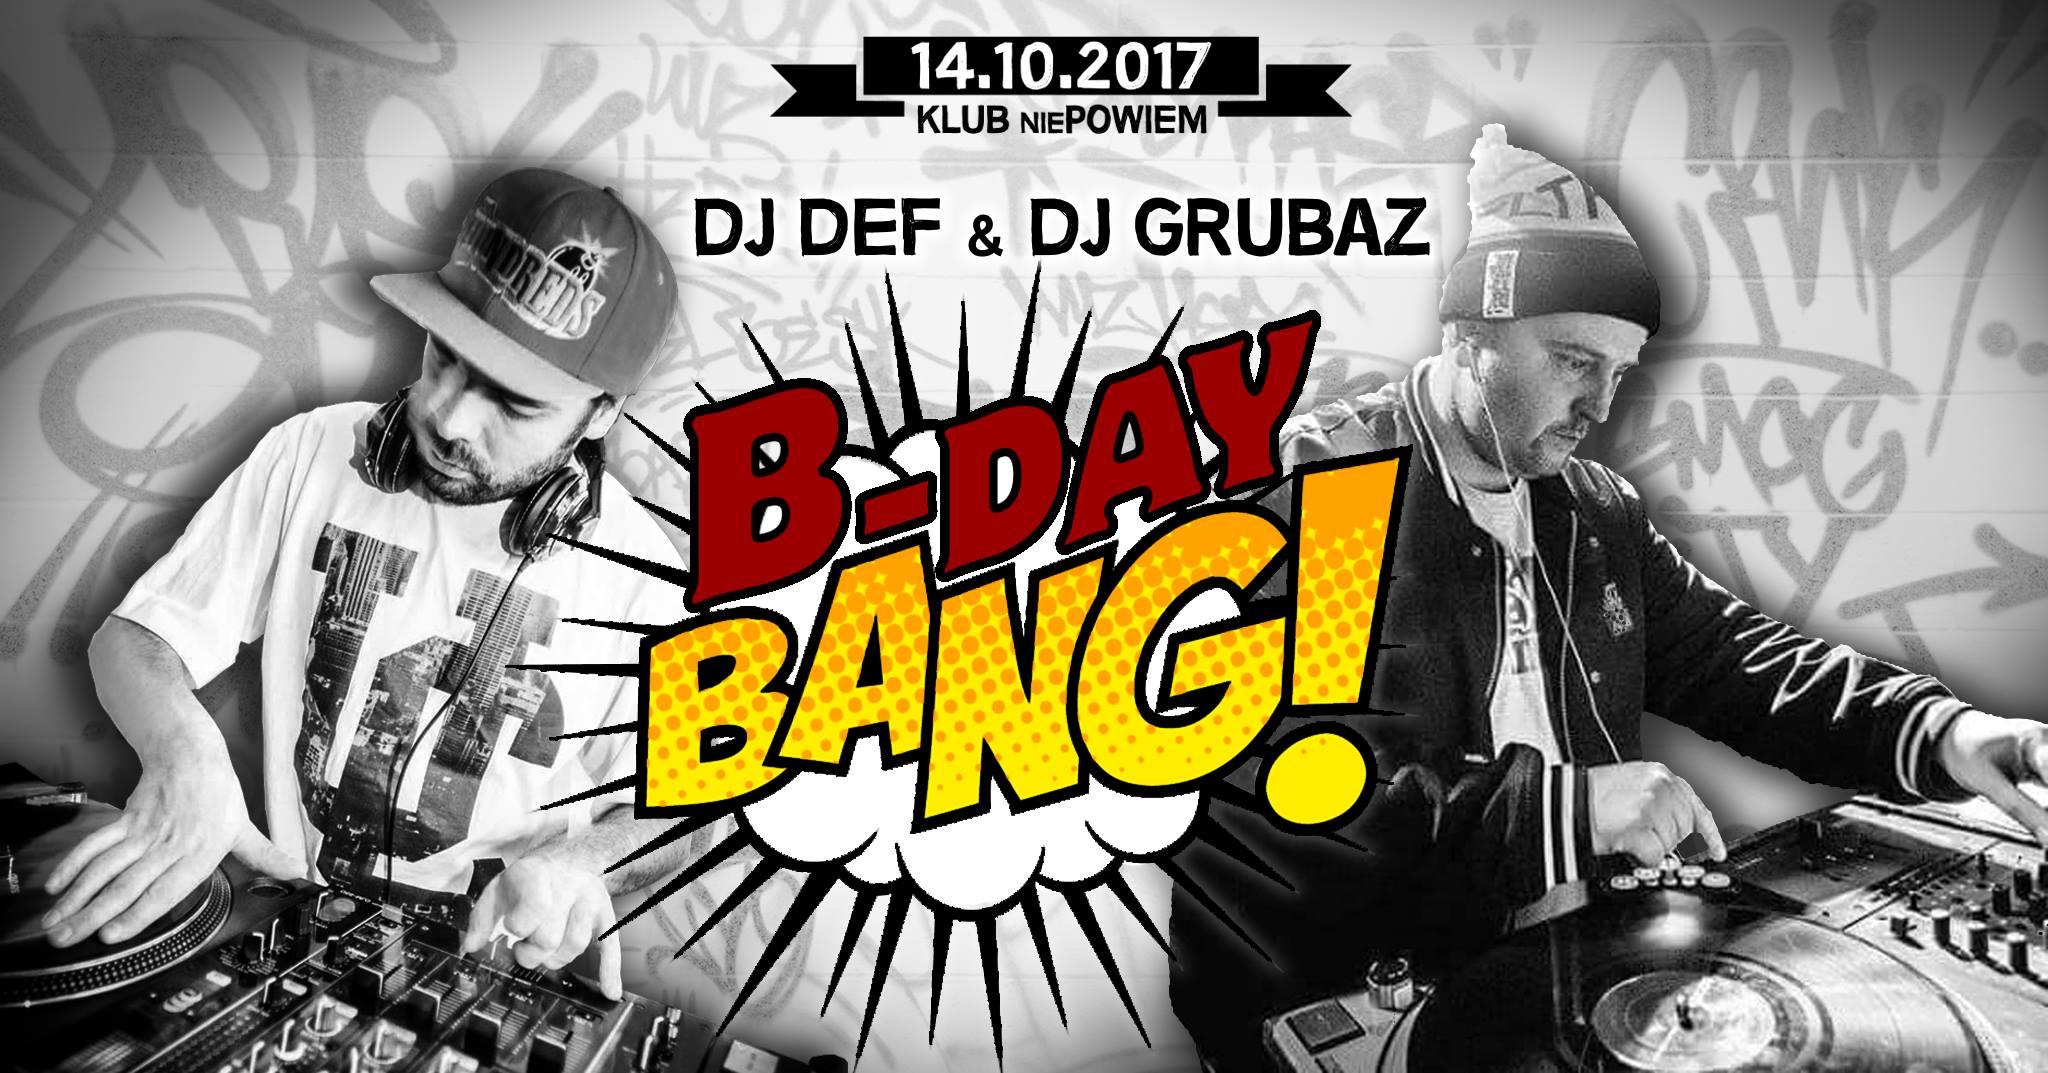 Dj Def & Dj Grubaz B-Day Bang / lista fb free*